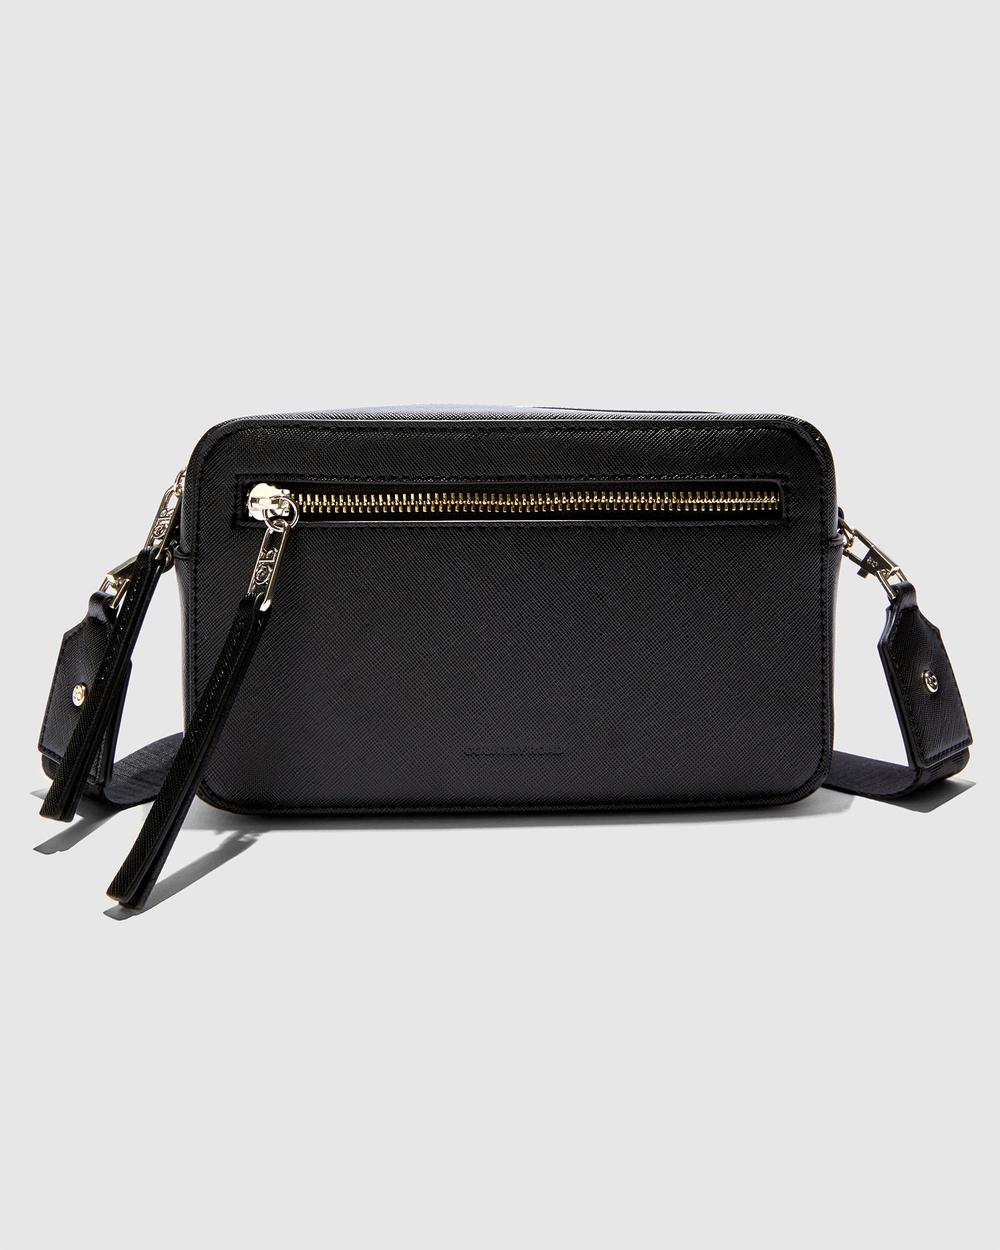 Country Road Branded Camera Bag Bags black